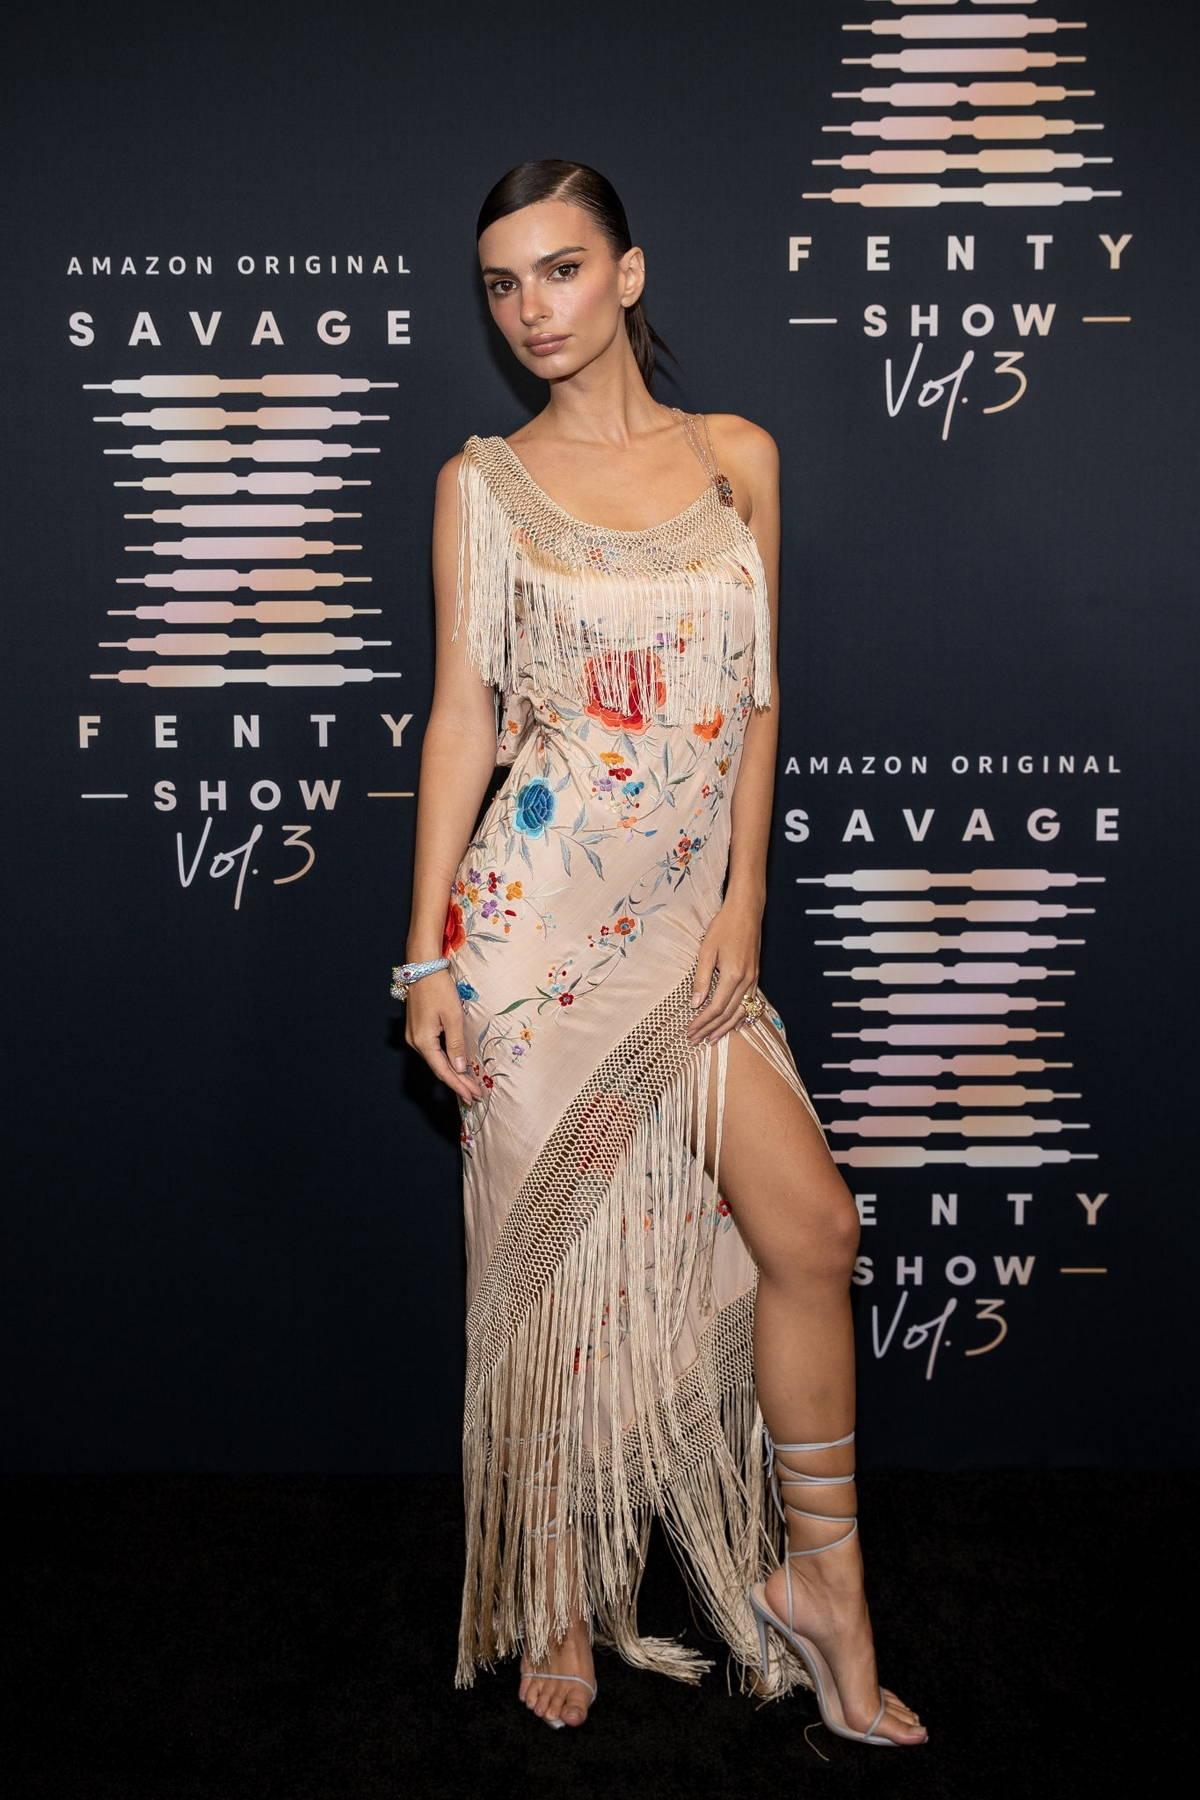 Emily Ratajkowski attends the Savage x Fenty Show Vol 3 in Los Angeles